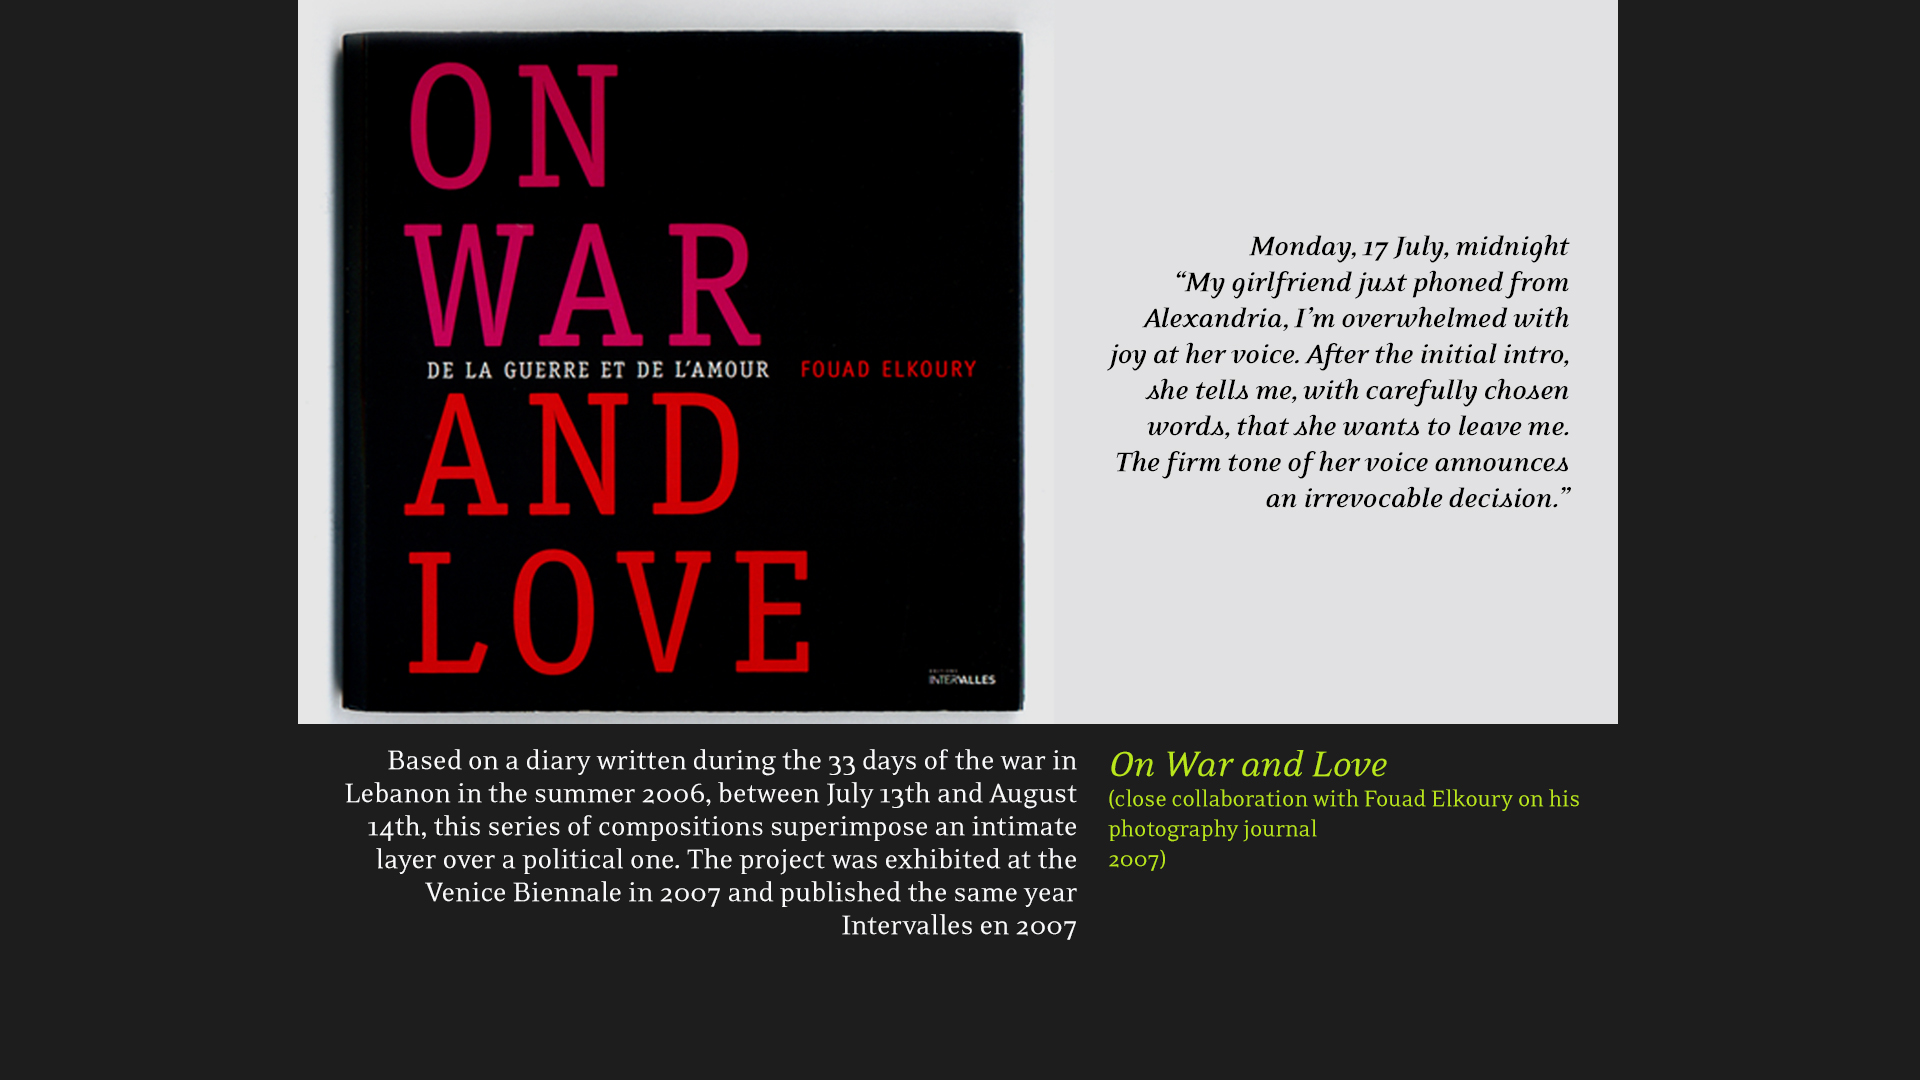 651_On War and Love_EN